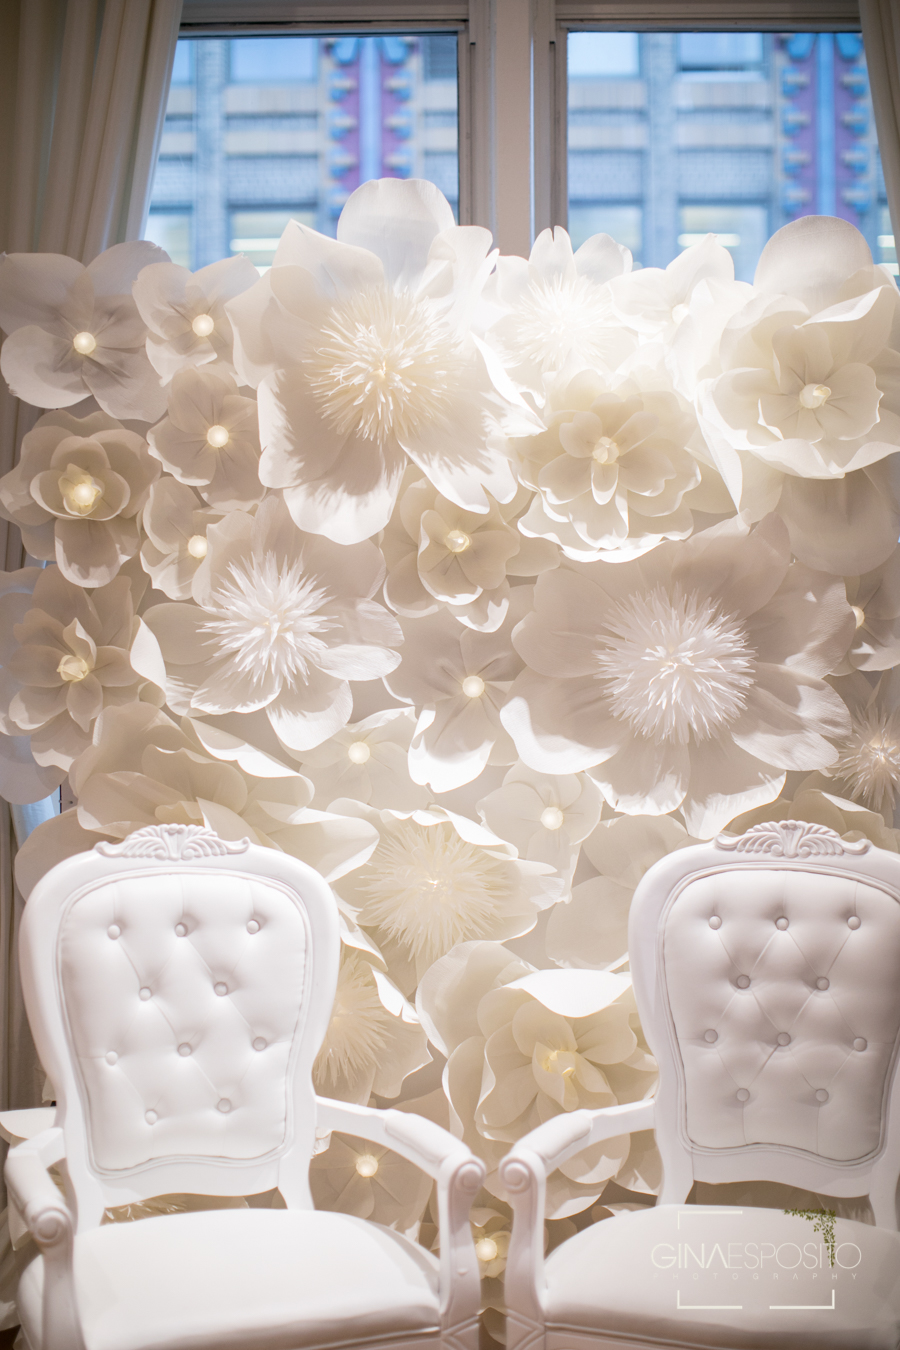 Wall Flowers | by Aster + Quail | www.asterandquail.com